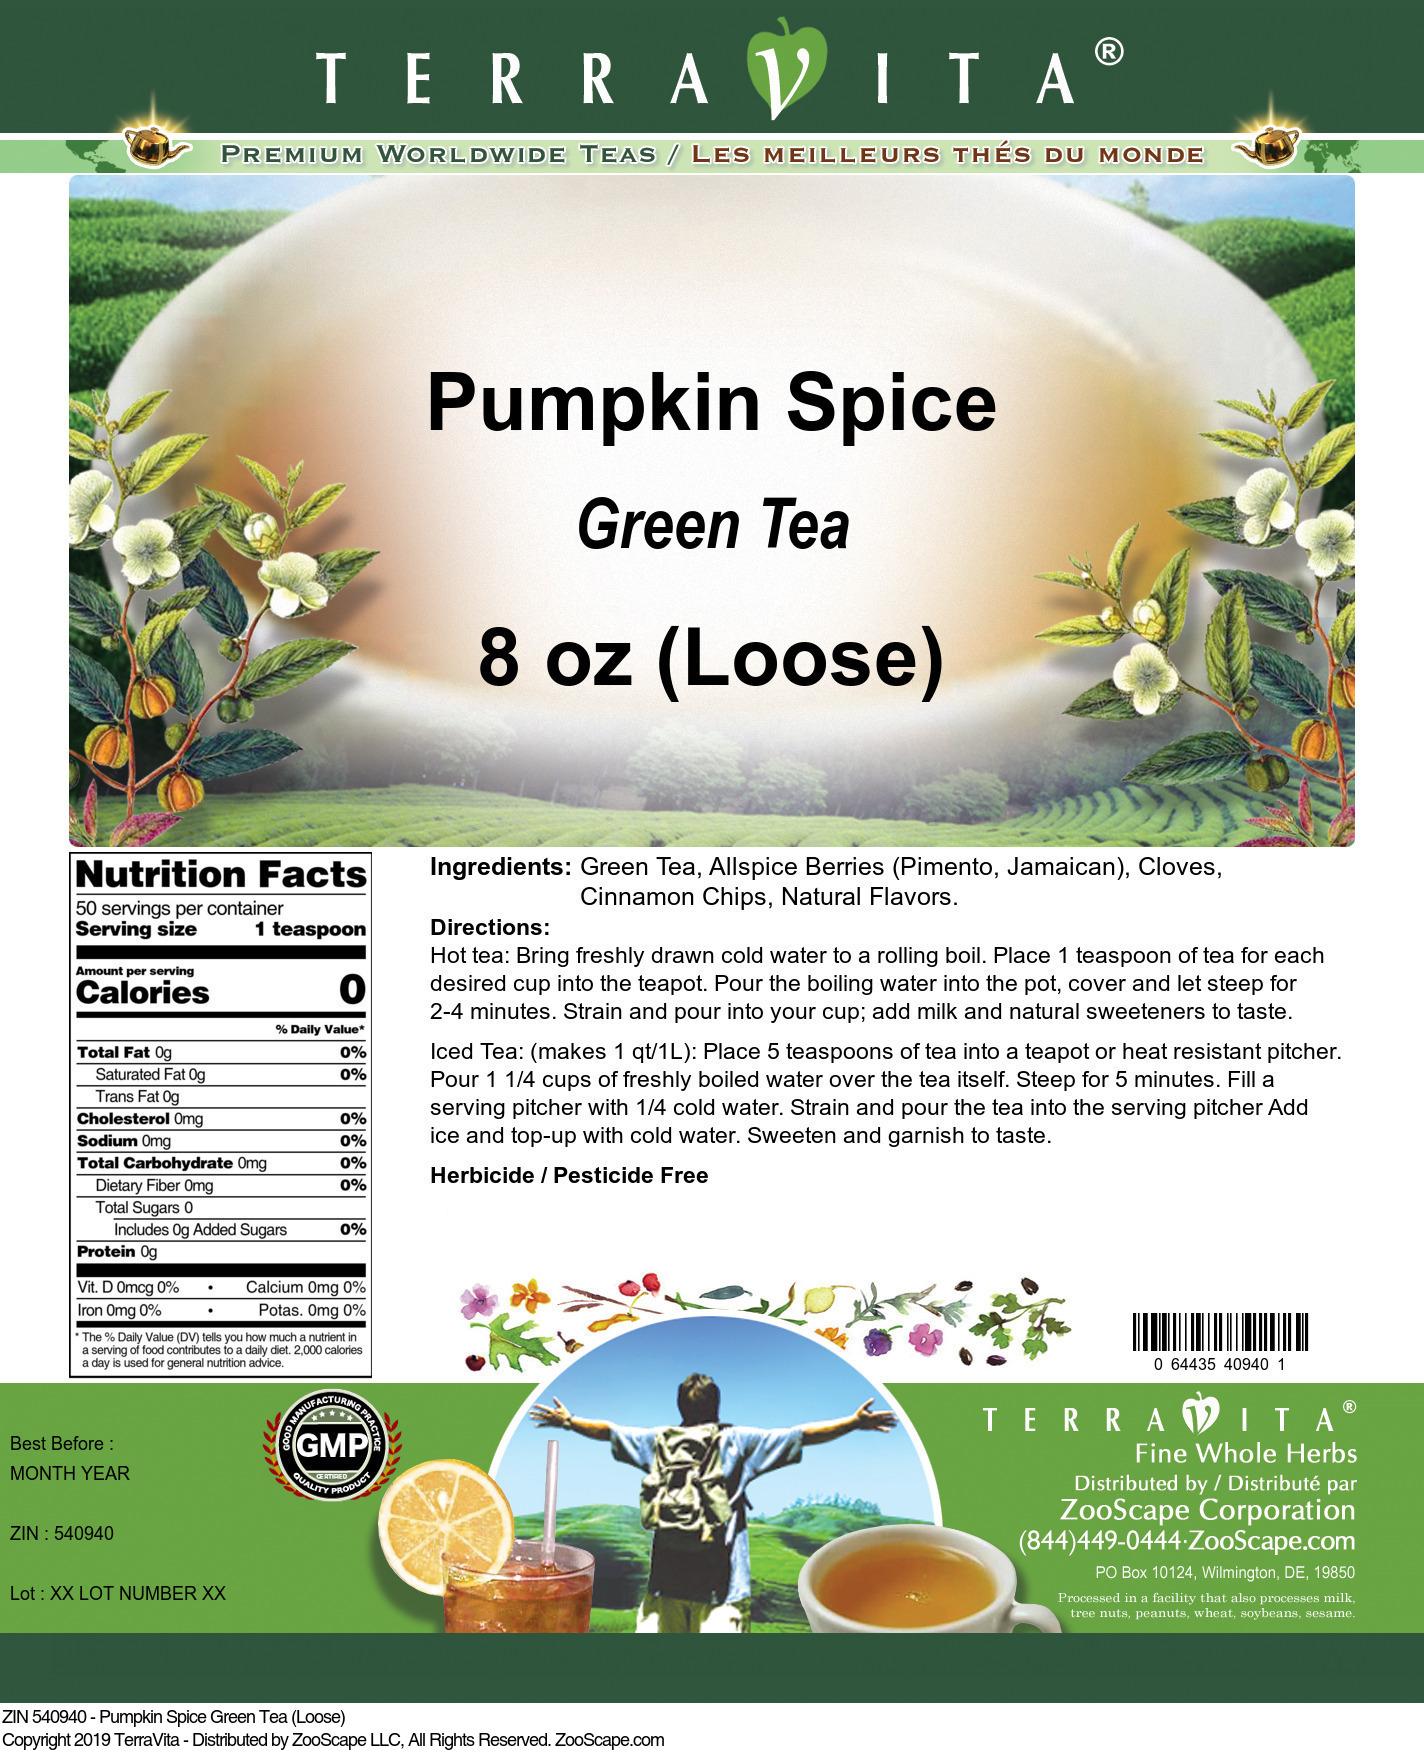 Pumpkin Spice Green Tea (Loose)